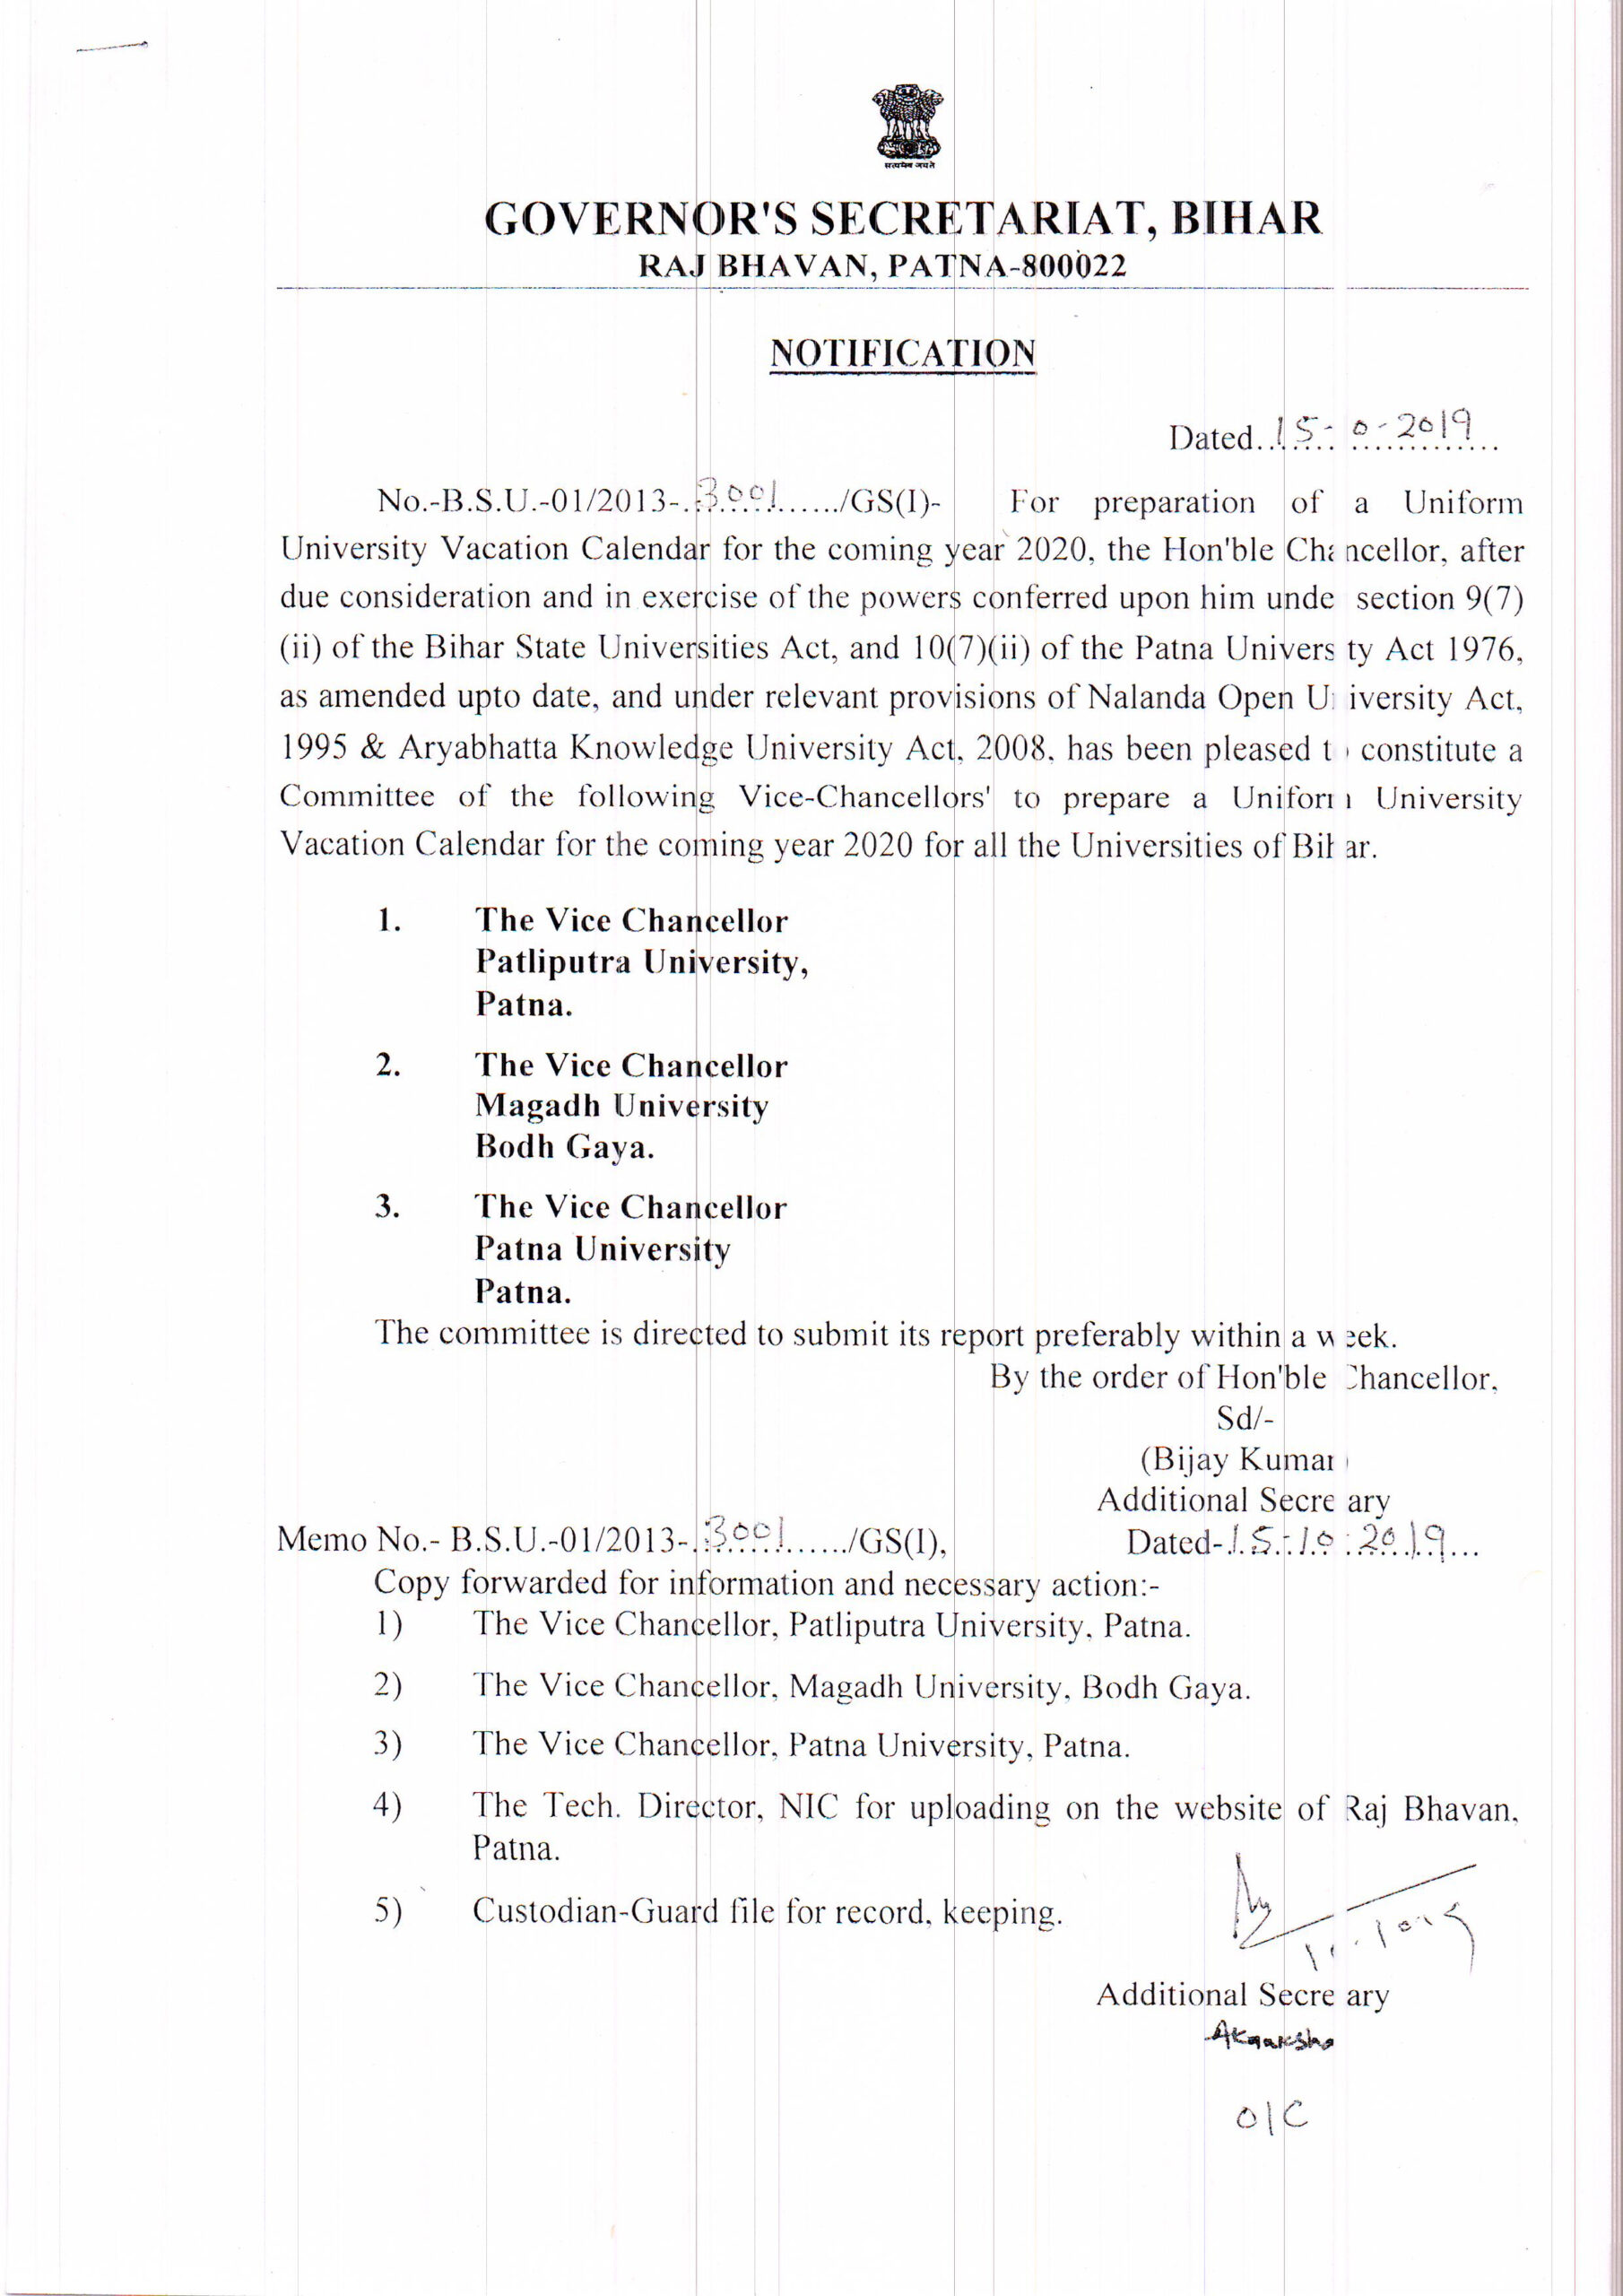 Bihar Sarkar Calendra 2020 | Calendar For Planning regarding Bihar Sarkar Holiday Calendar